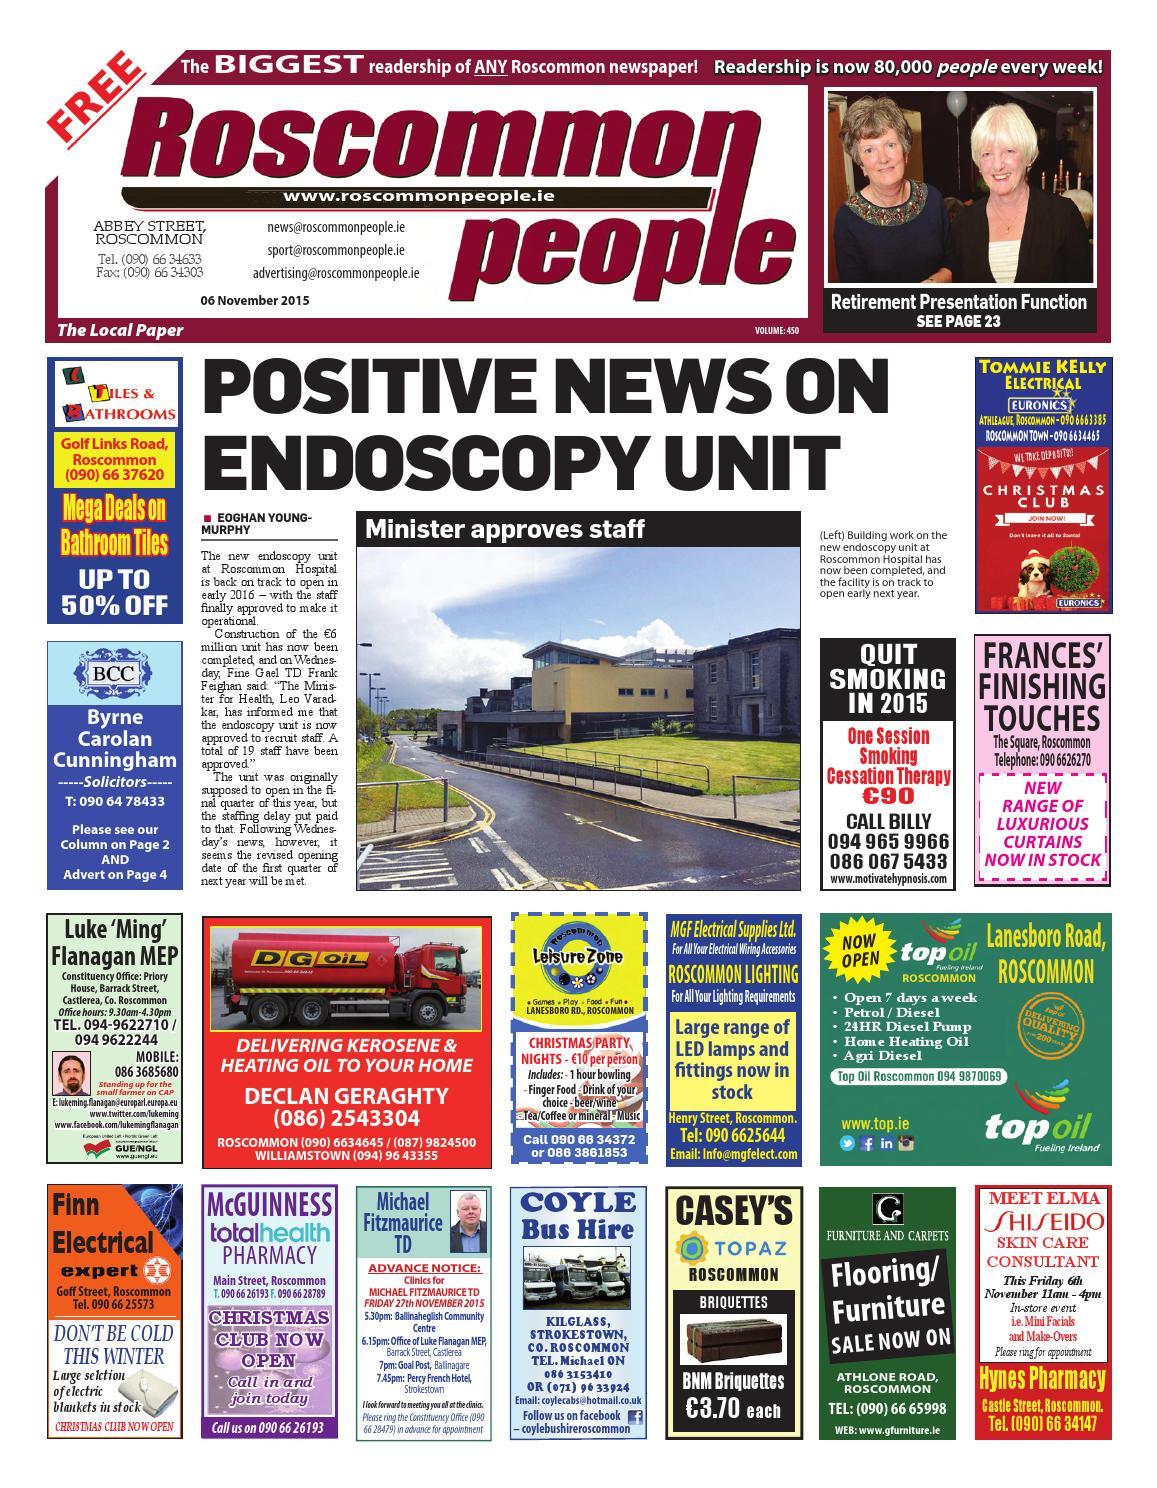 castlerea local area plan 2016 - 2022 - Roscommon County